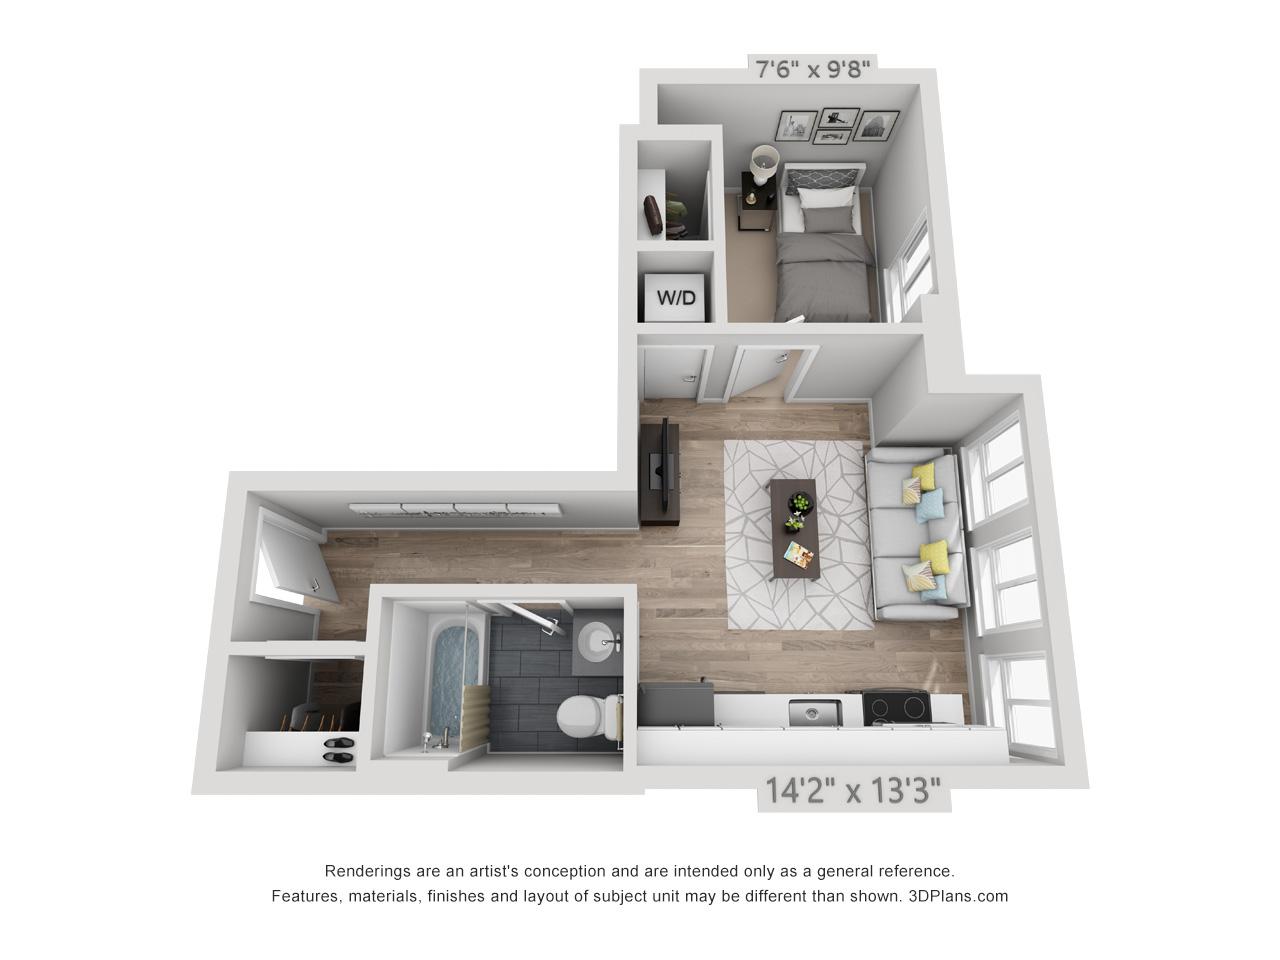 Apartments in center city philadelphia icon - One bedroom apartments in philadelphia ...